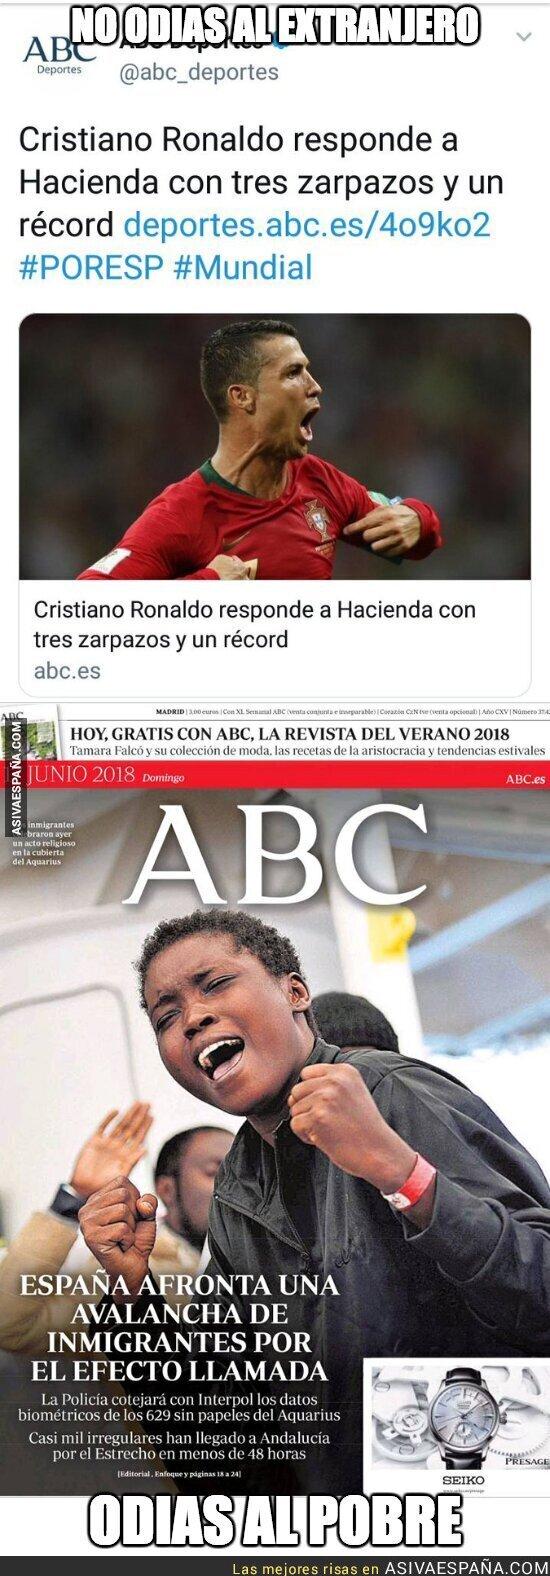 88484 - El periodismo basura del diario ABC